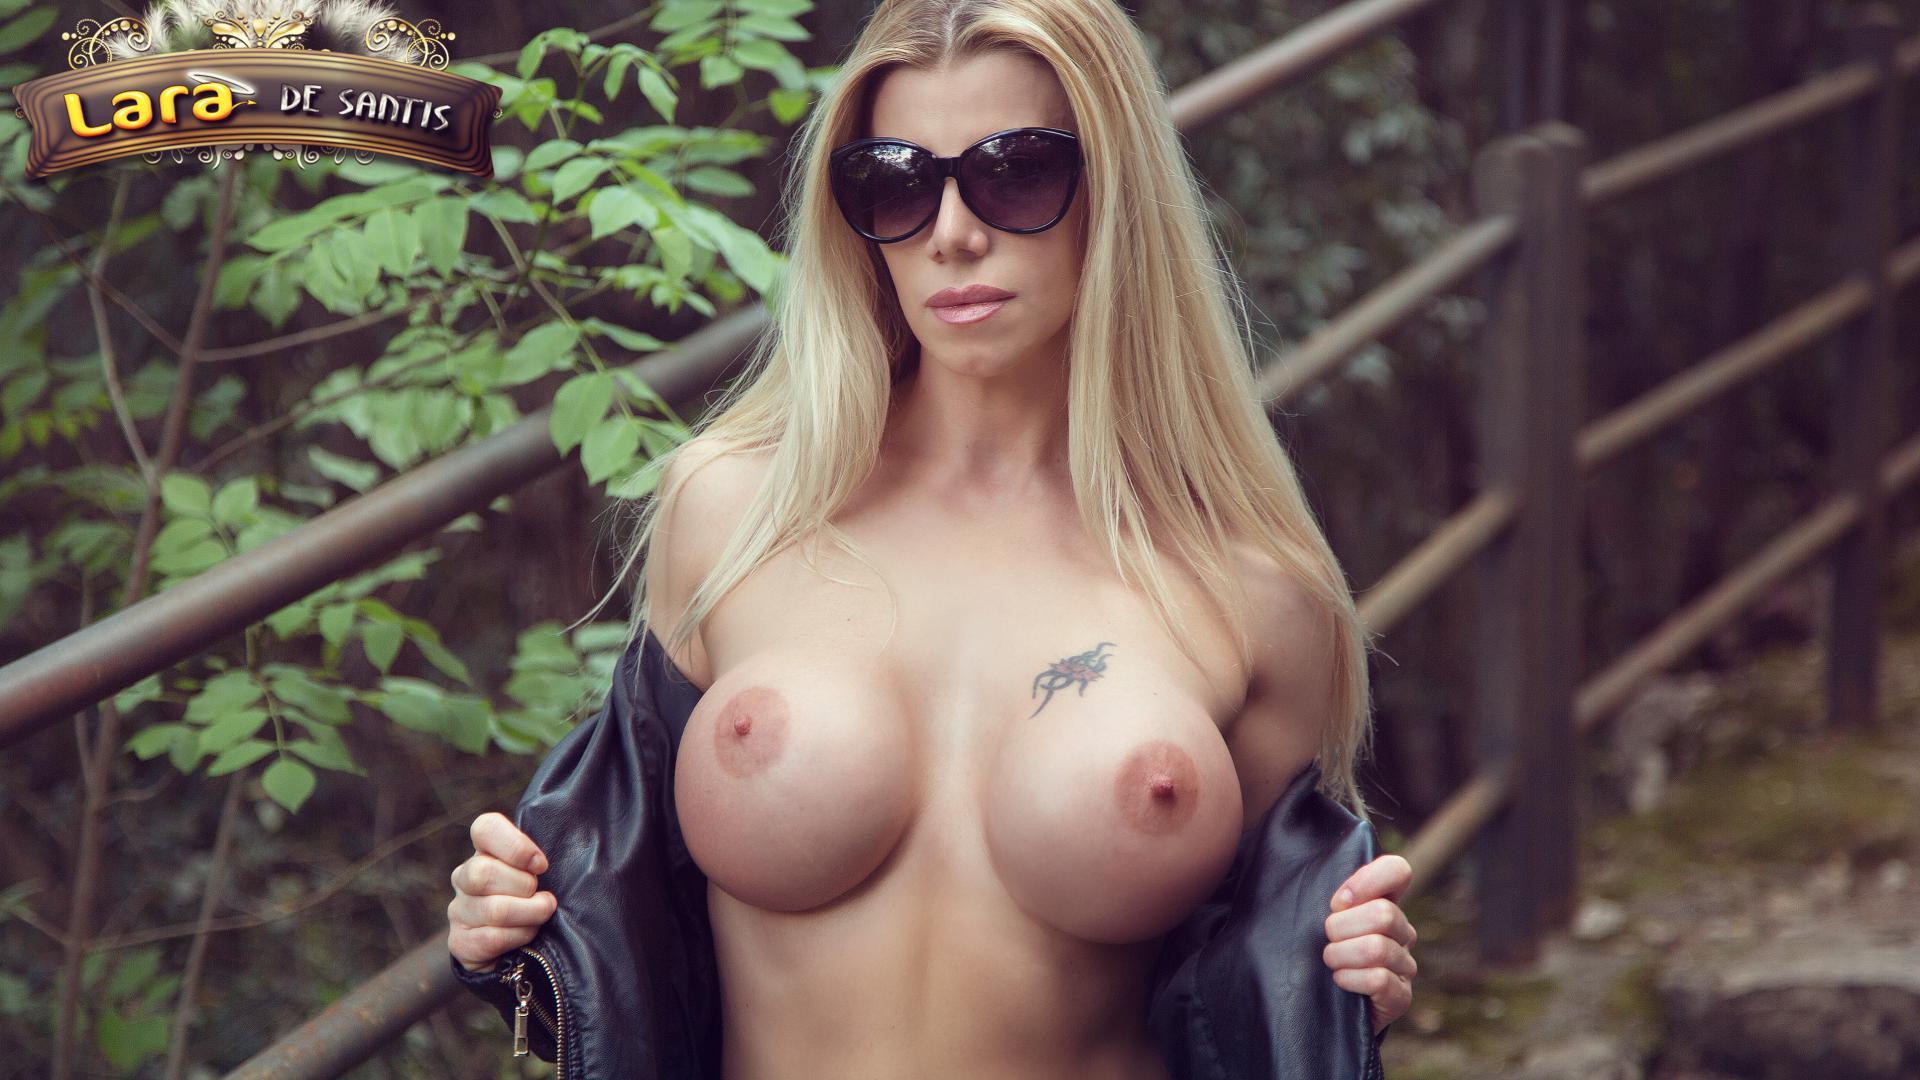 Babe Lara Porn Star download photo 1920x1080, lara de santis, big boobs, tits